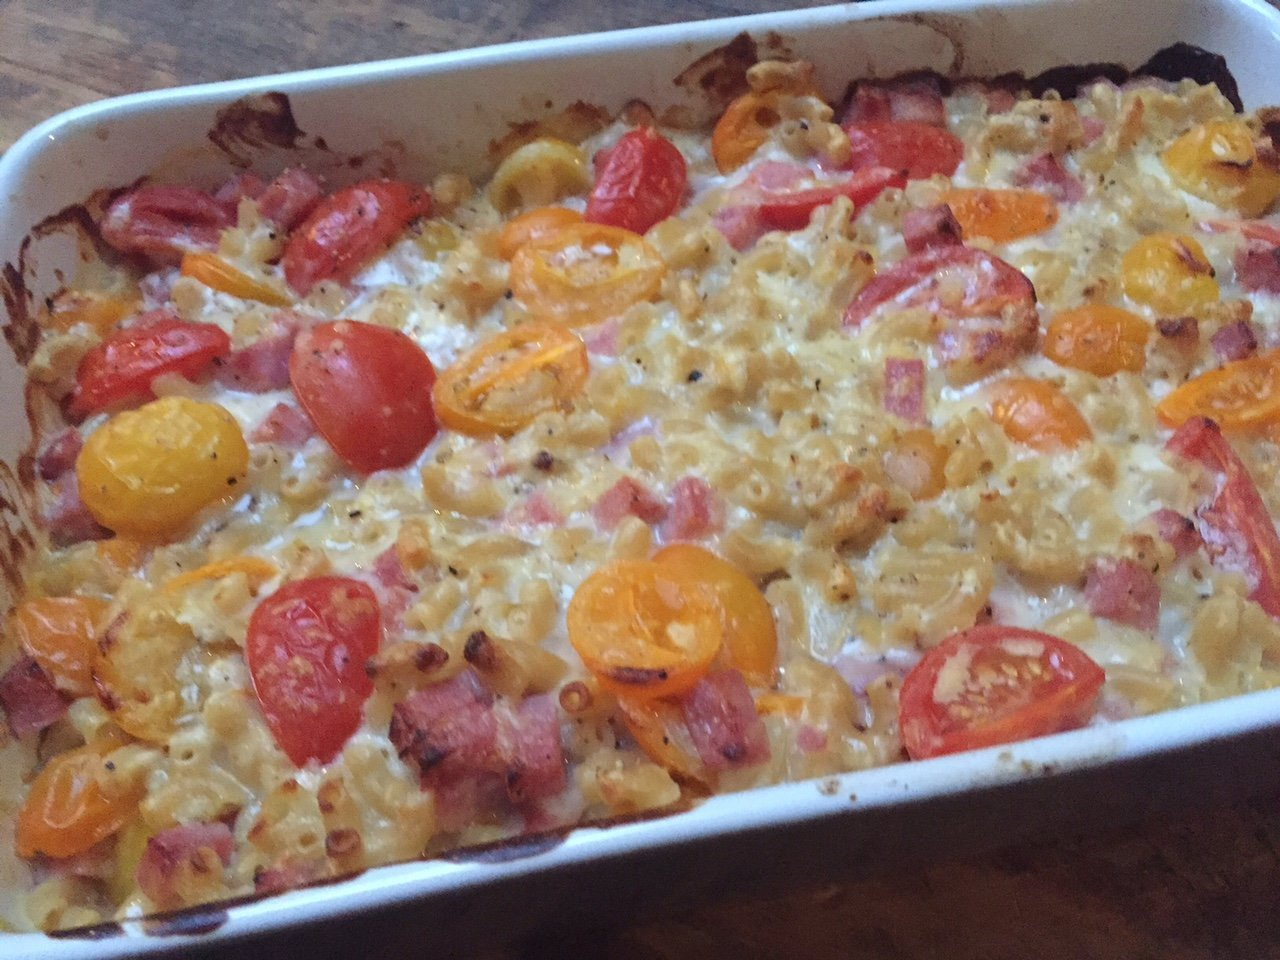 Ham kaas macaroni ovenschotel recept foodblog Foodinista